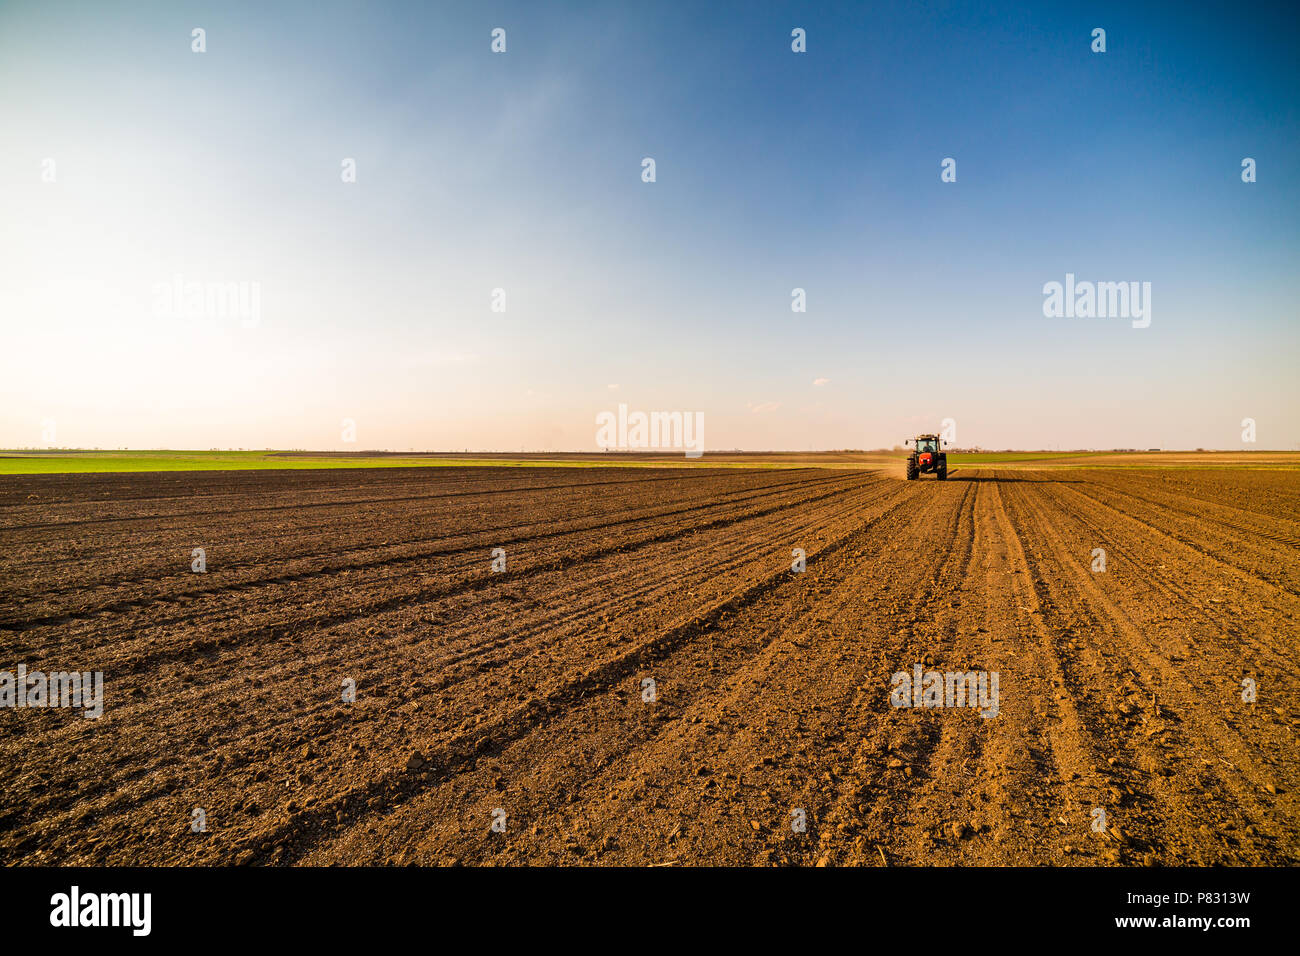 Farmer fertilizing arable land with nitrogen, phosphorus, potassium fertilizer - Stock Image